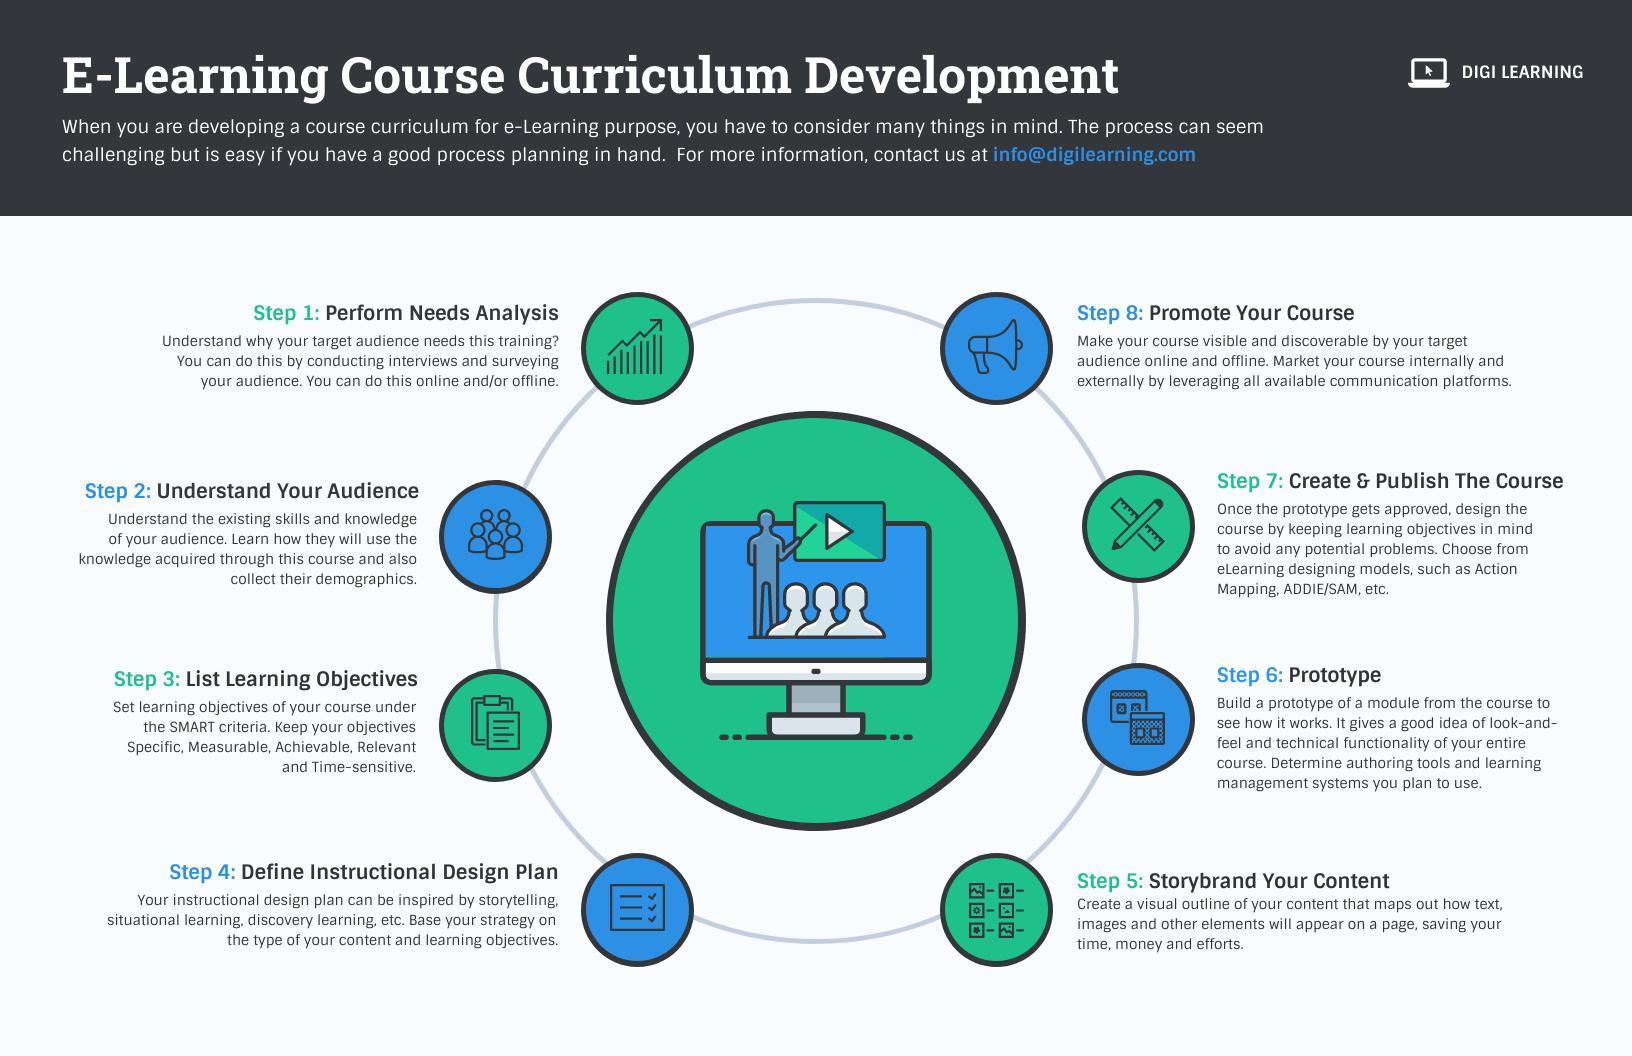 employee training and development course curriculum development